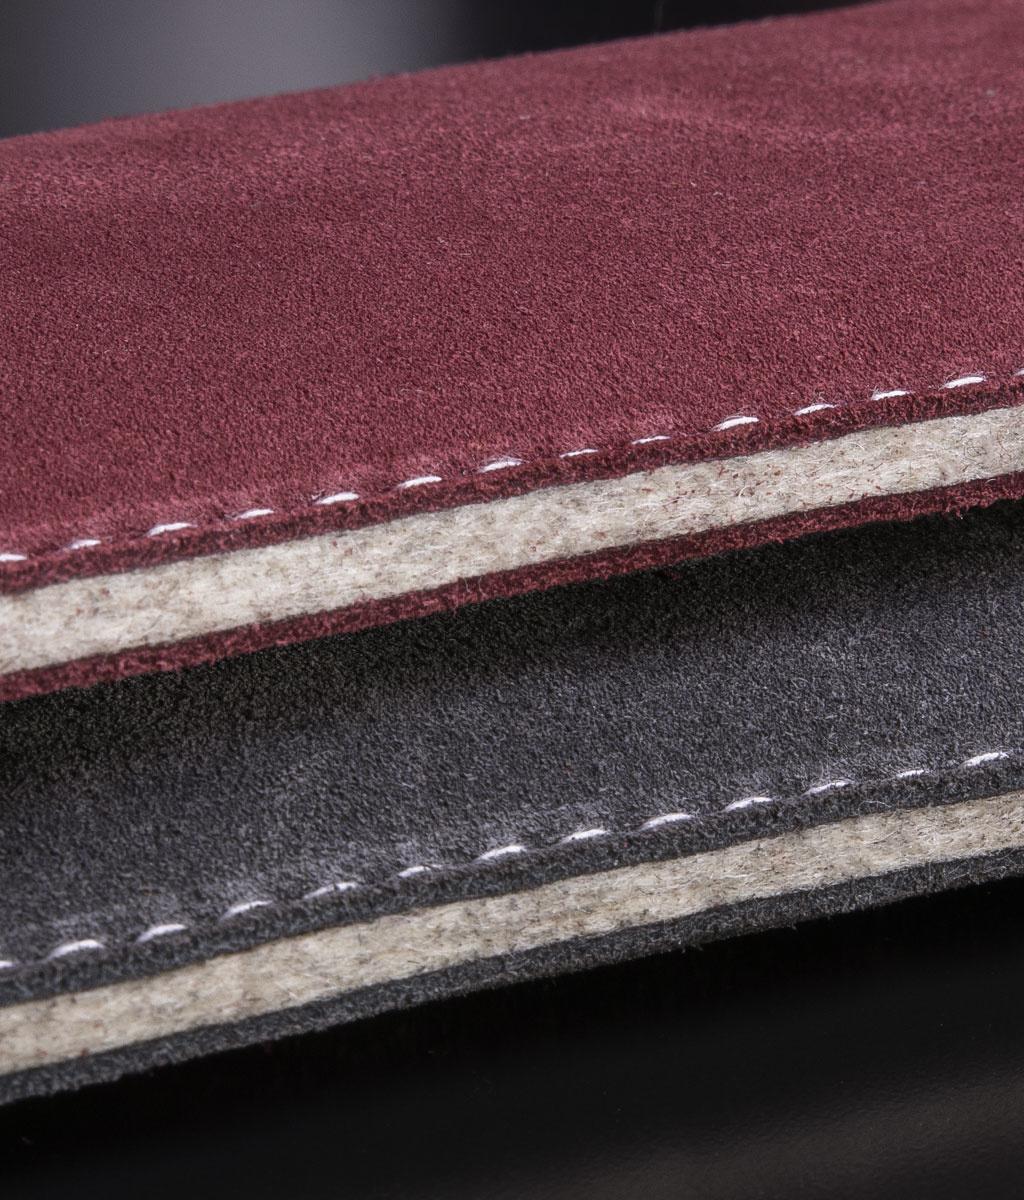 Galaxy S10, S10 Plus, S10e suede leather sleeve SCHUTZMASSNAHME